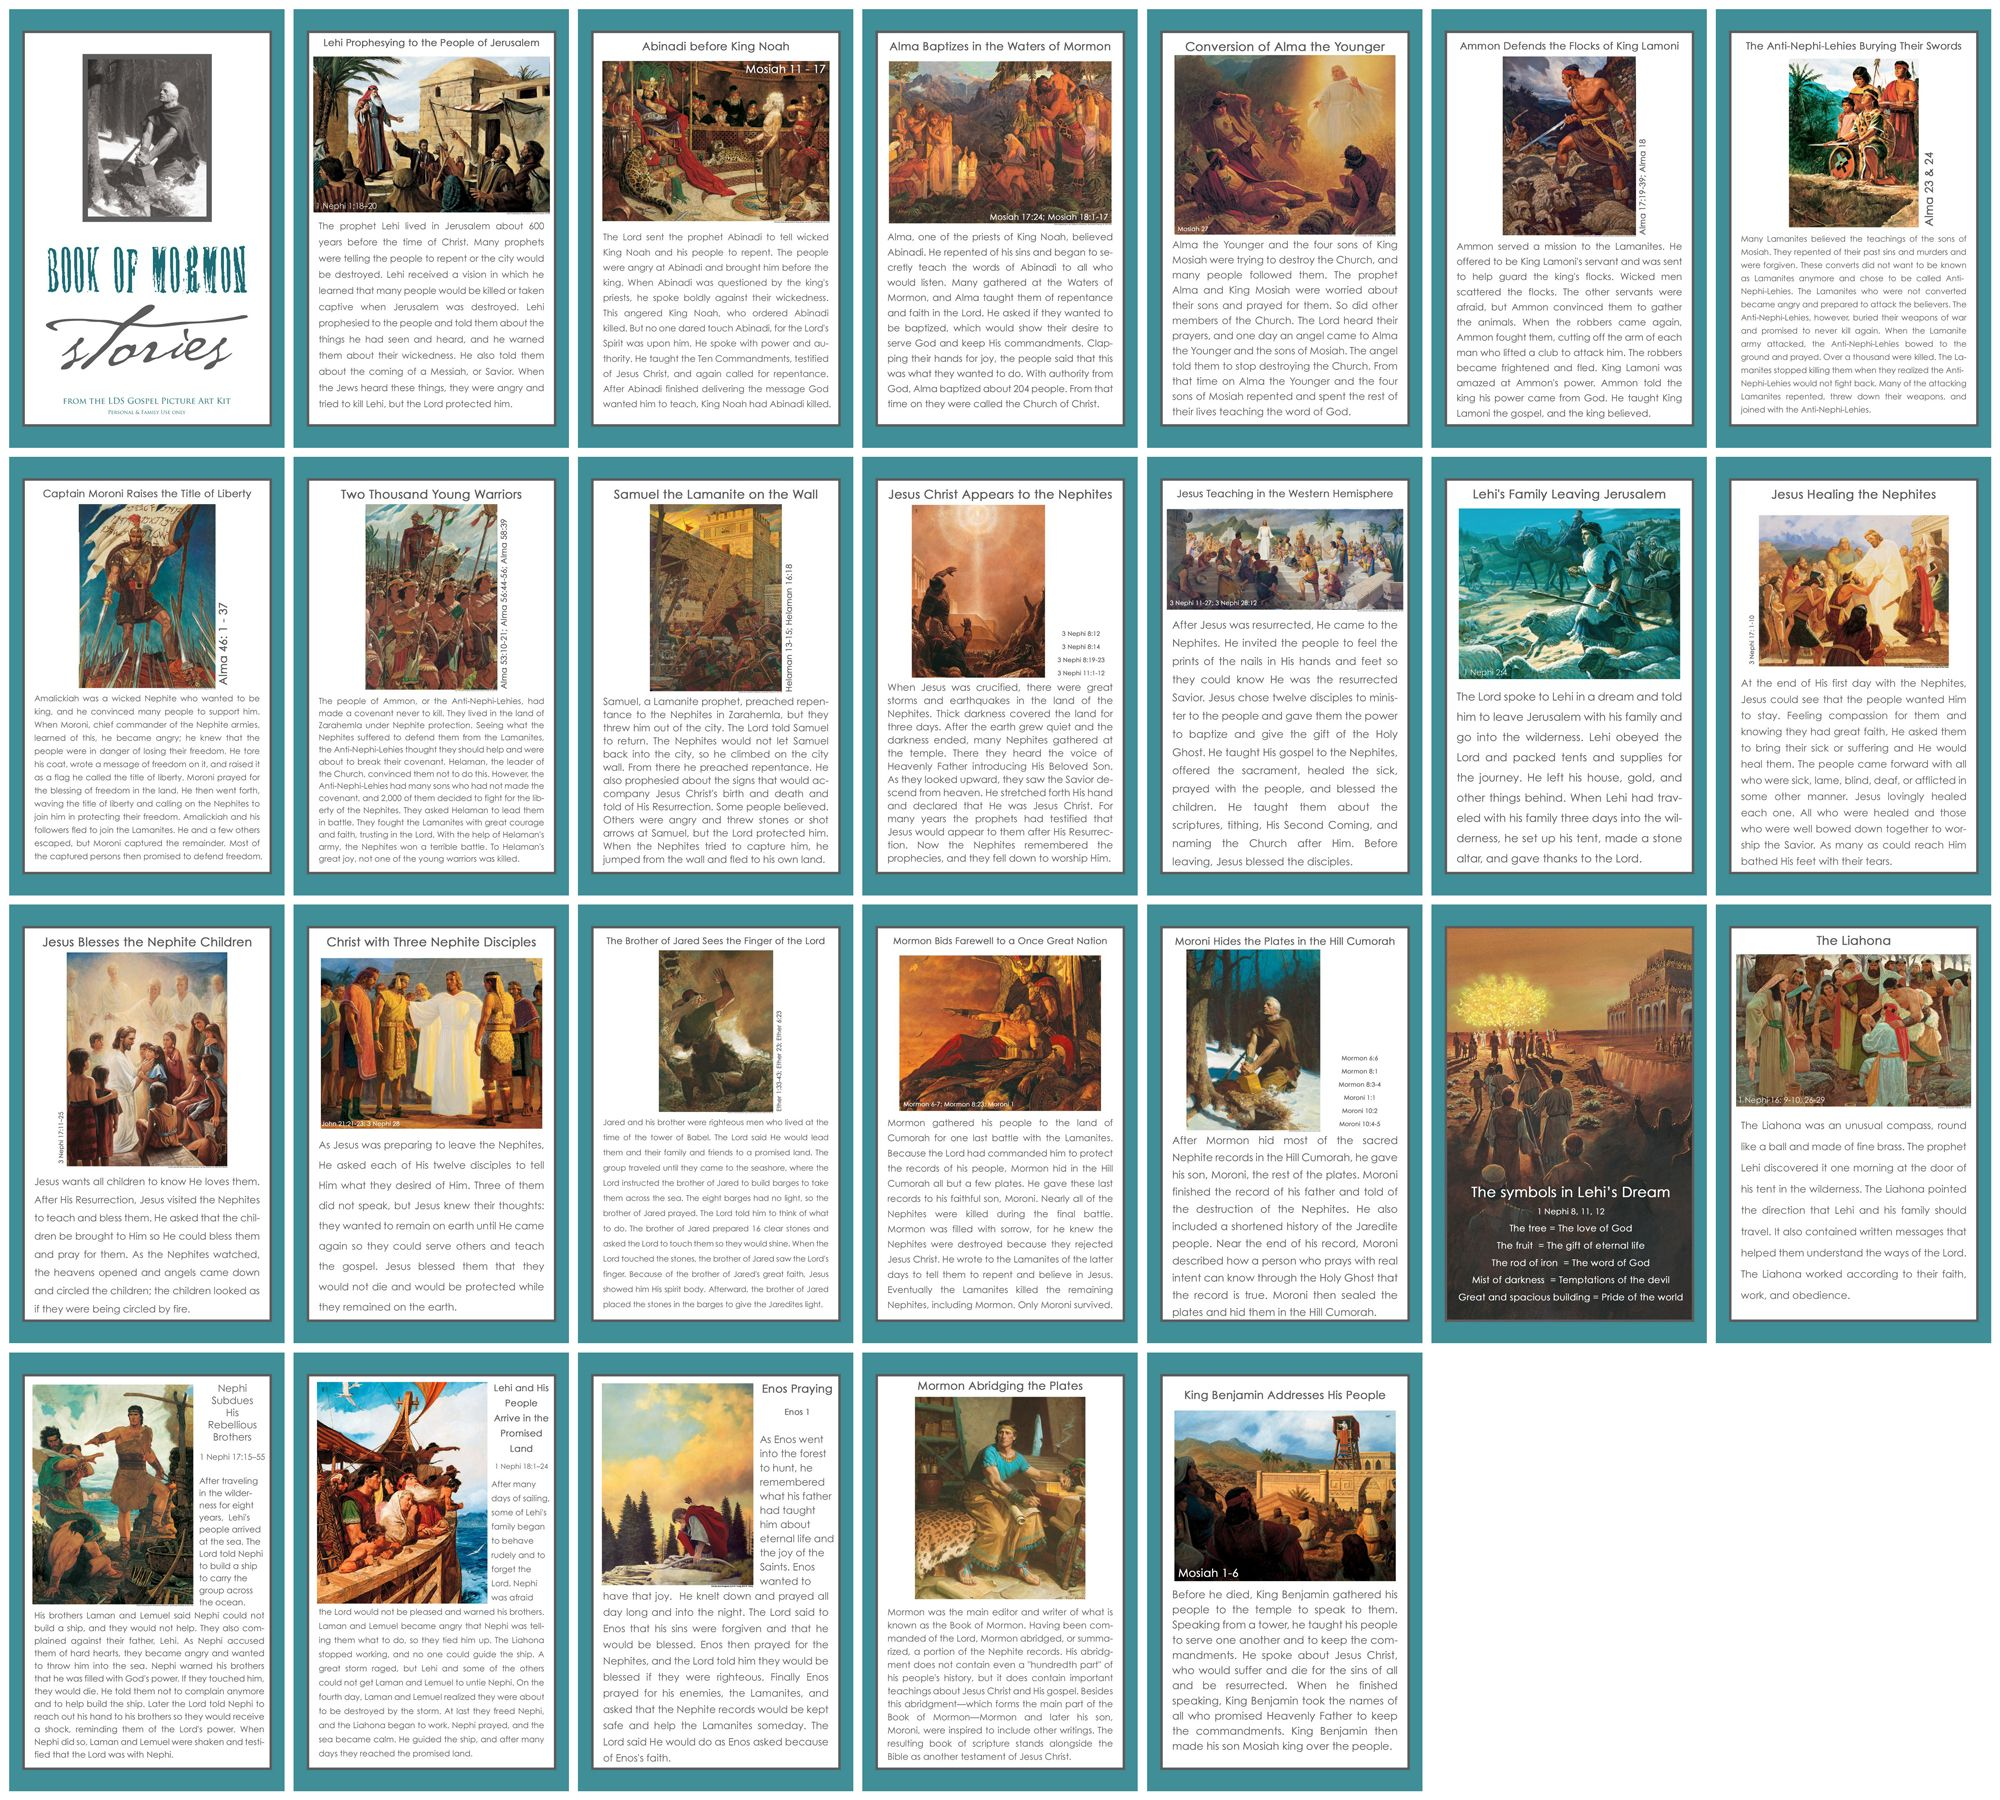 40+ Book of mormon stories remix ideas